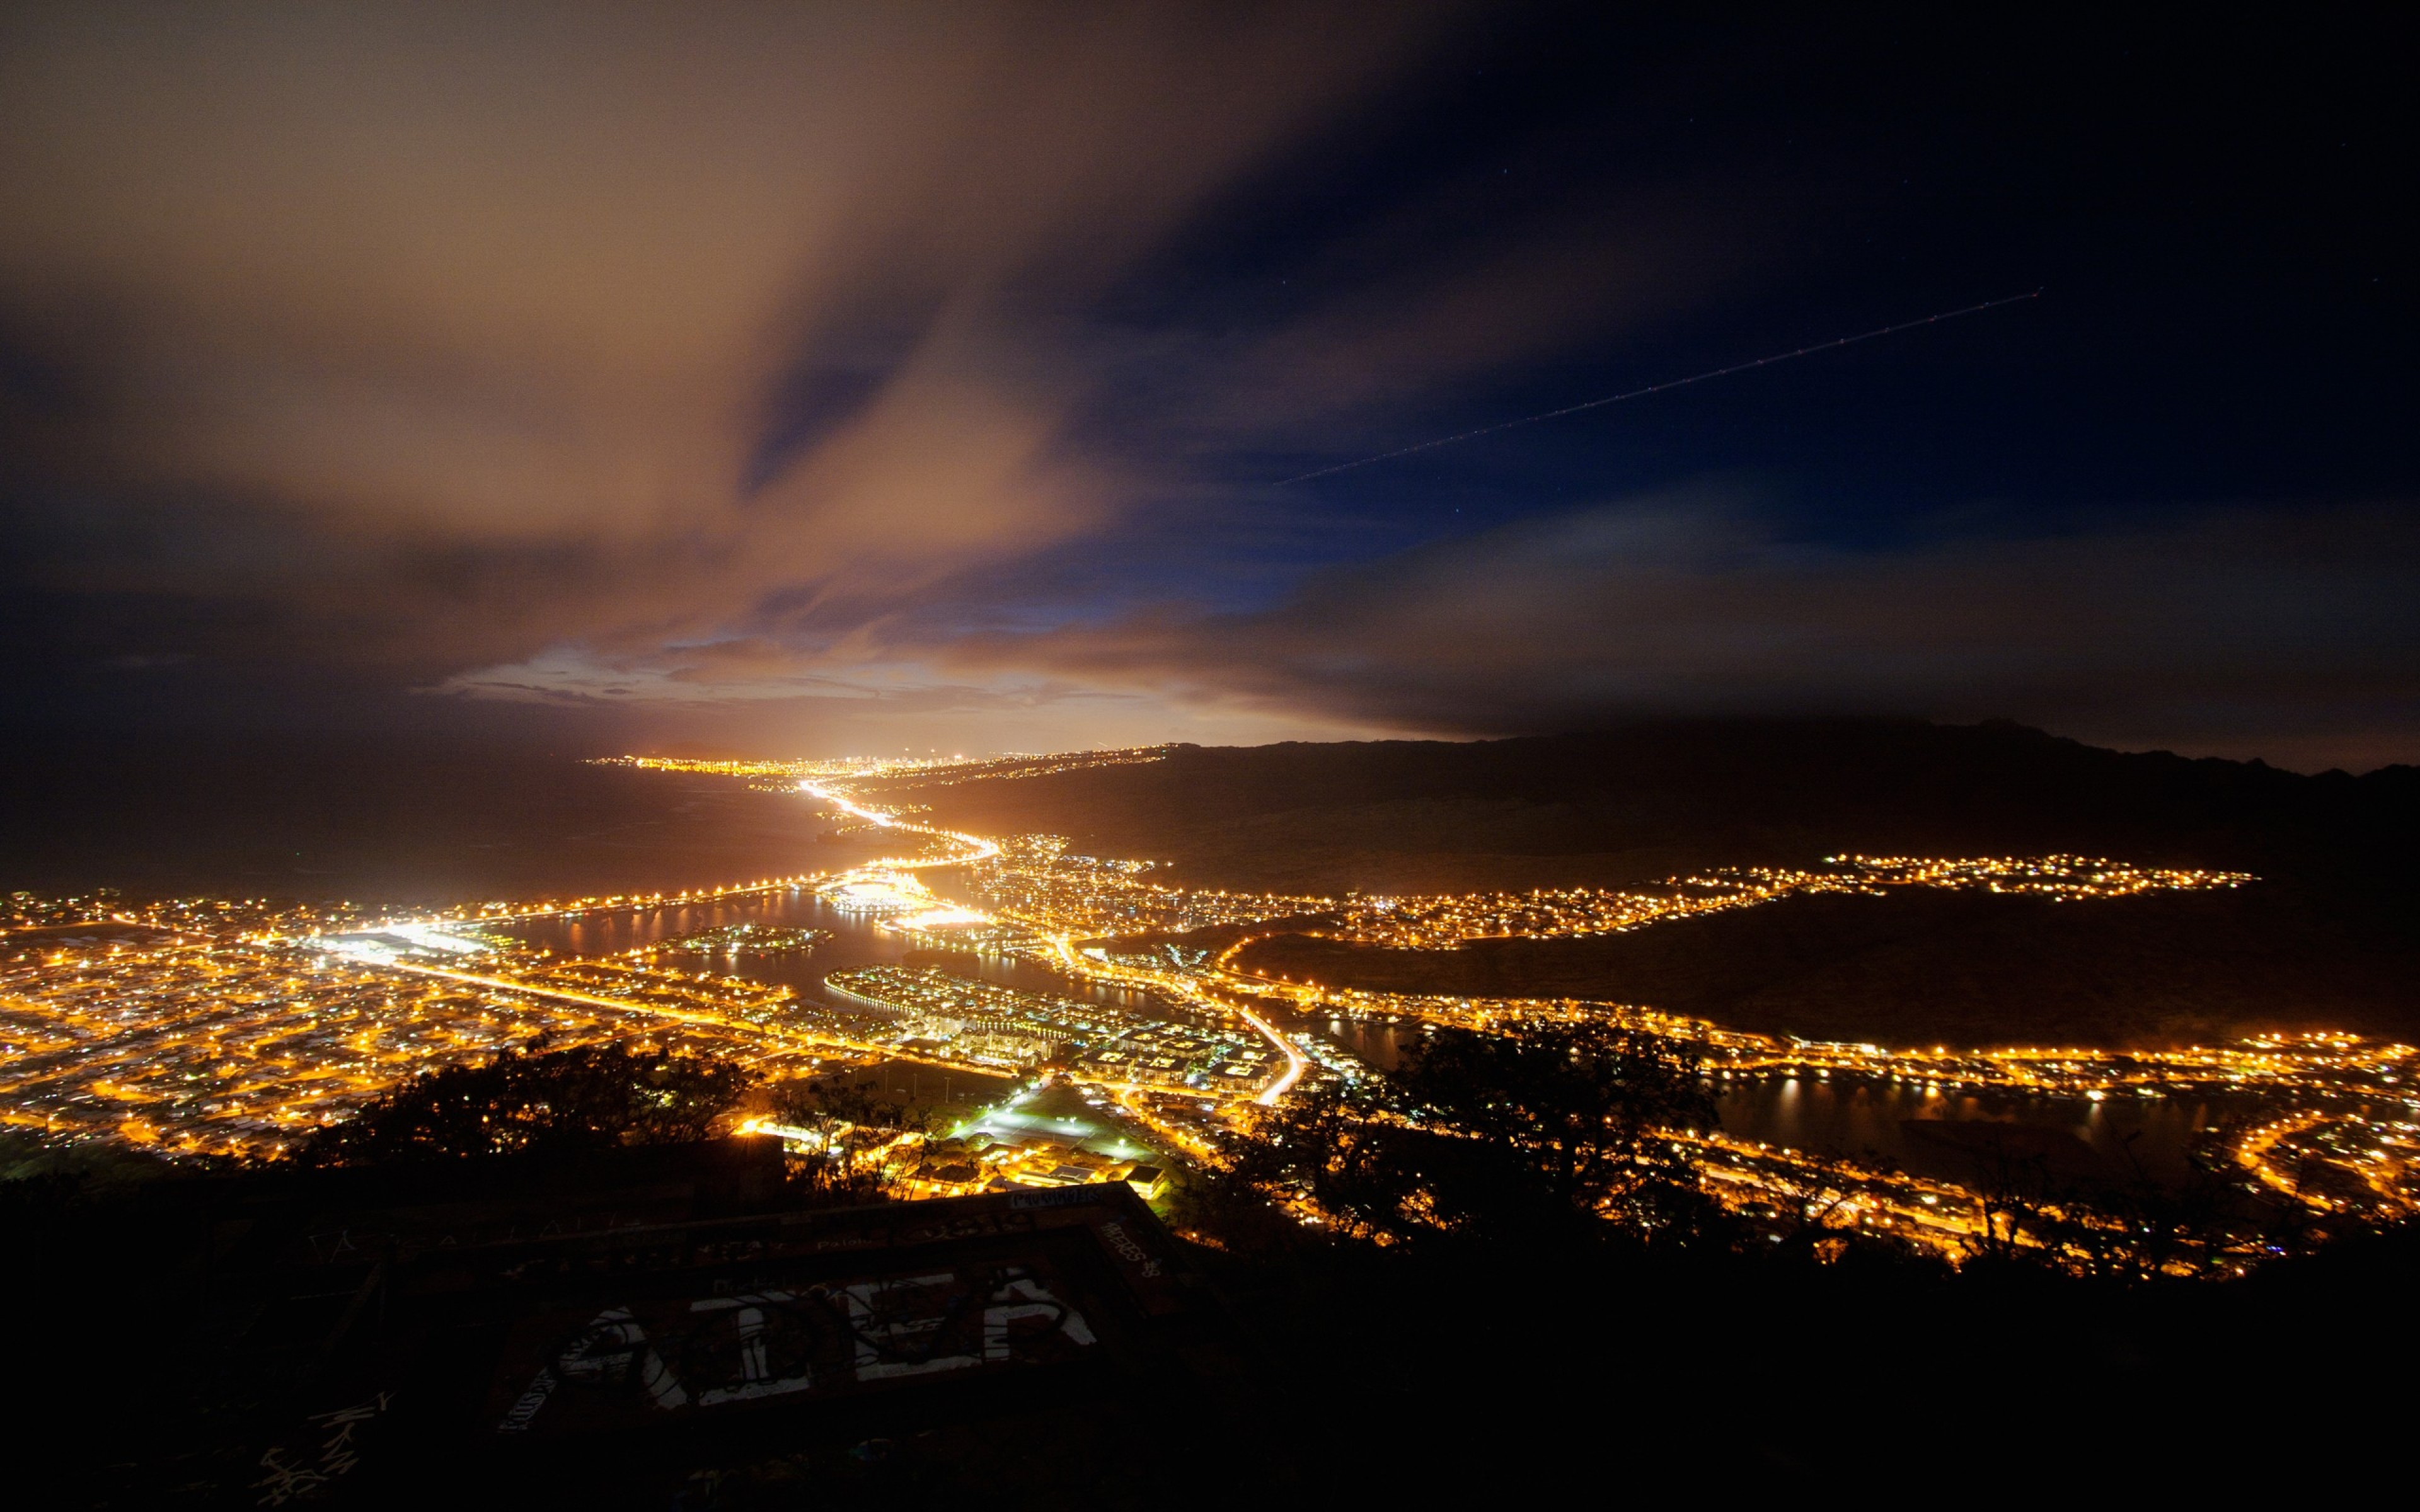 city night sky background - photo #20